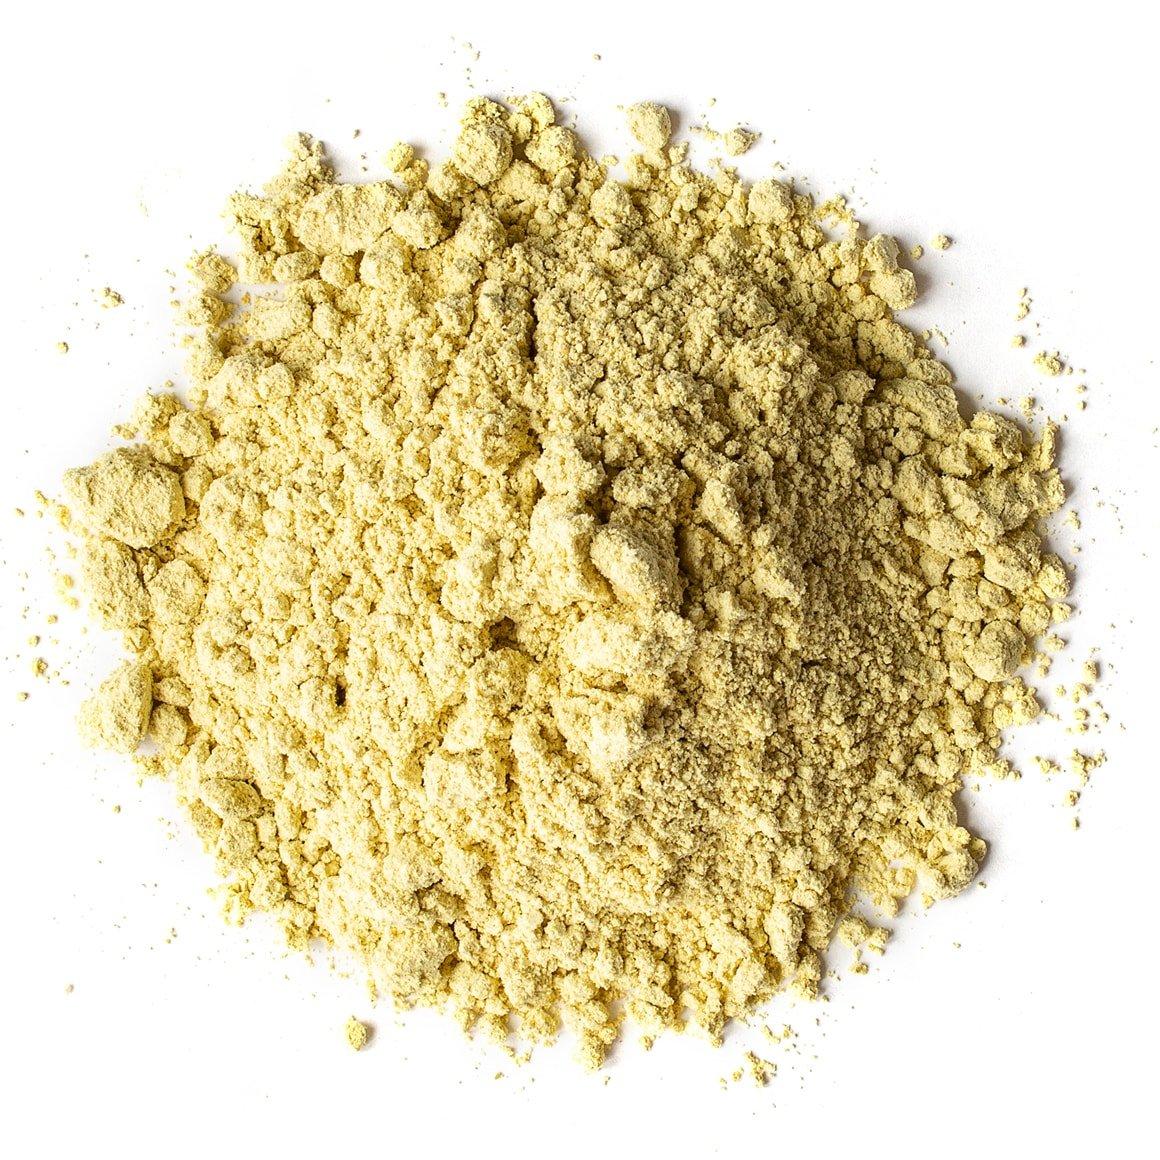 Organic Fenugreek Powder Buy in Bulk from Food to Live